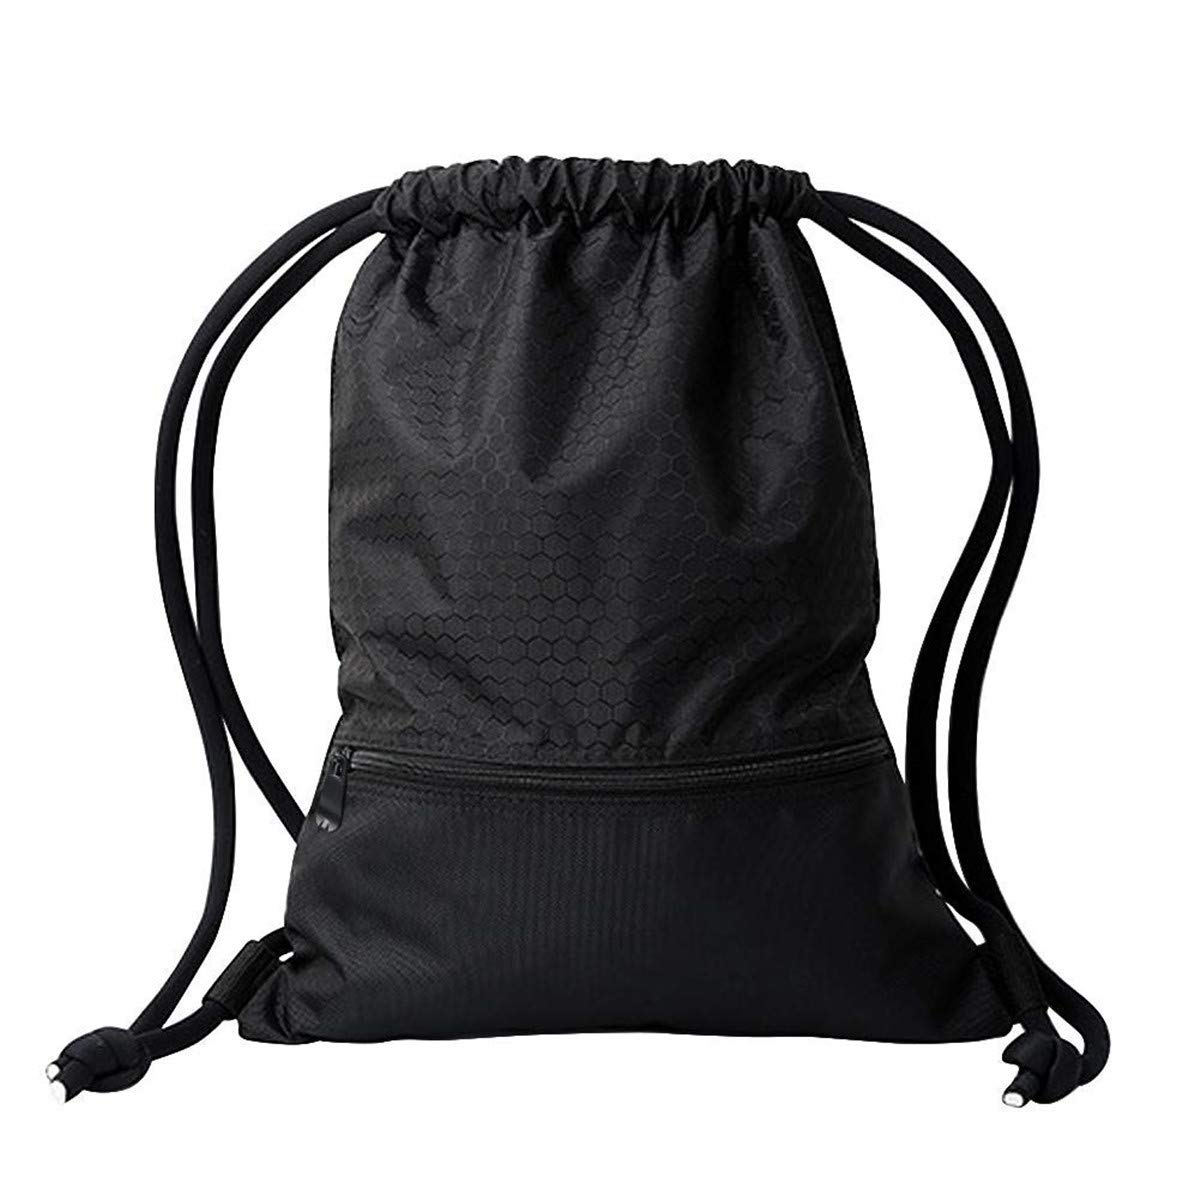 Bradlwy Sport beute Sacca beute Zaino tasche con cordoncini per Viaggi Fitness Attivit/à all aria aperta